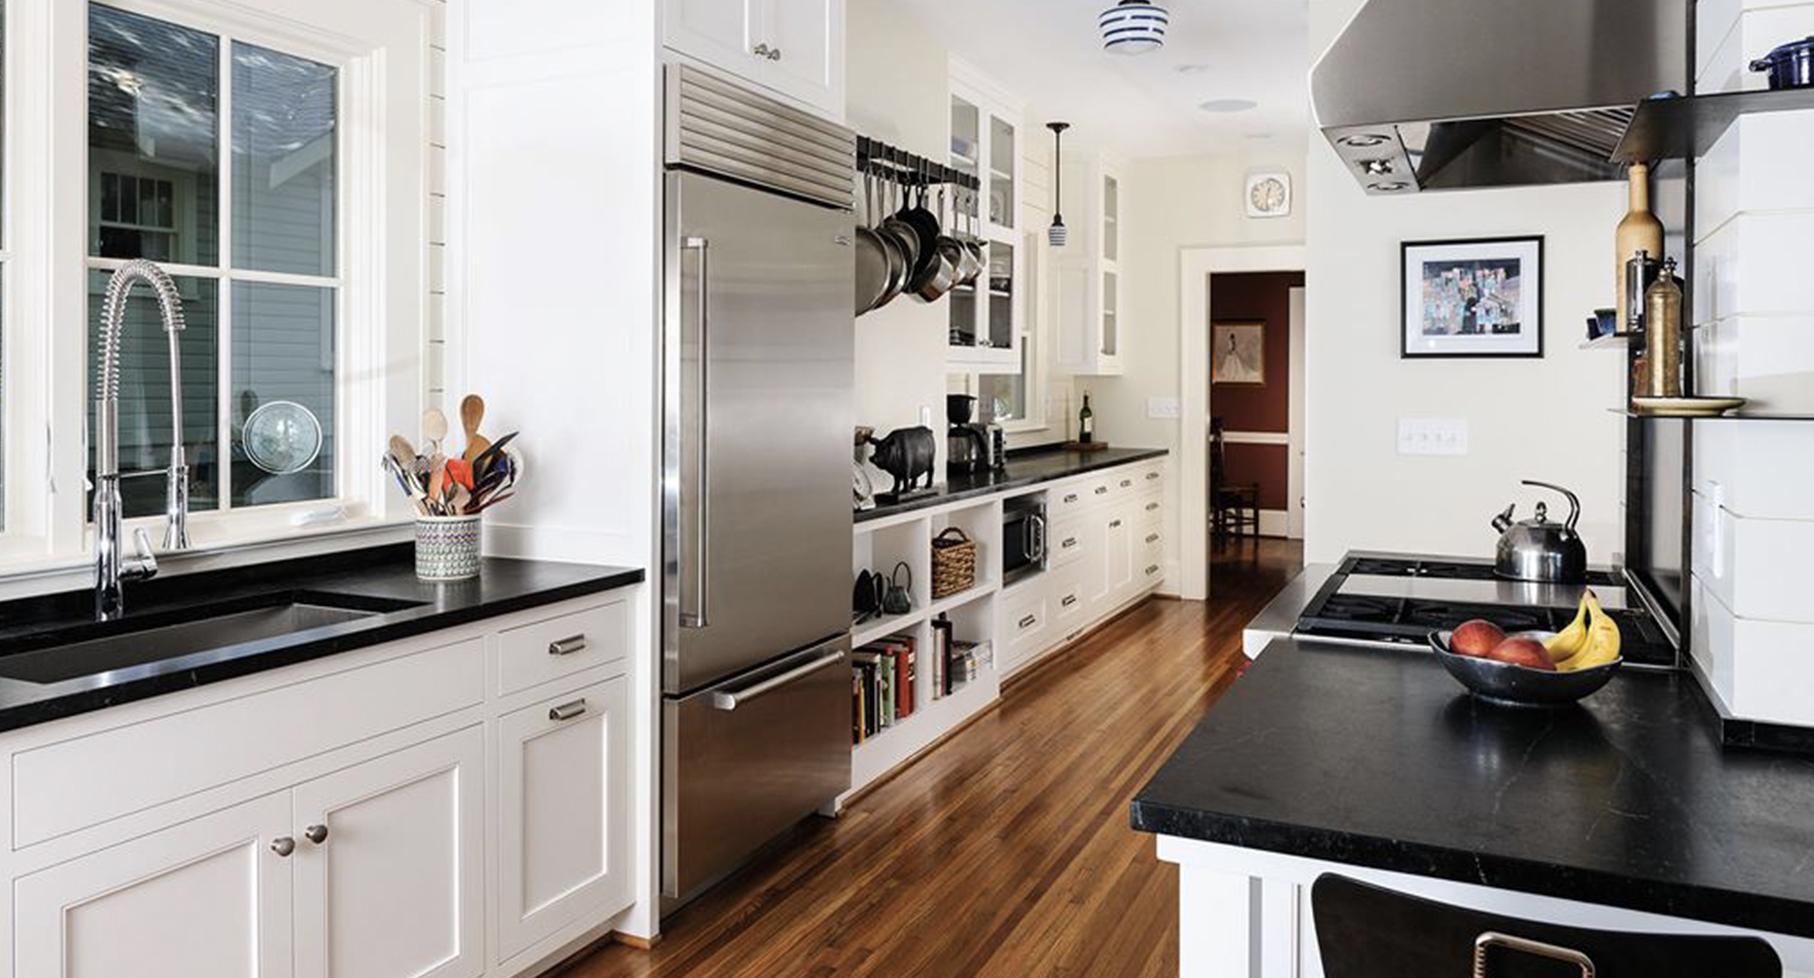 Sub-Zero fridge in full kitchen image